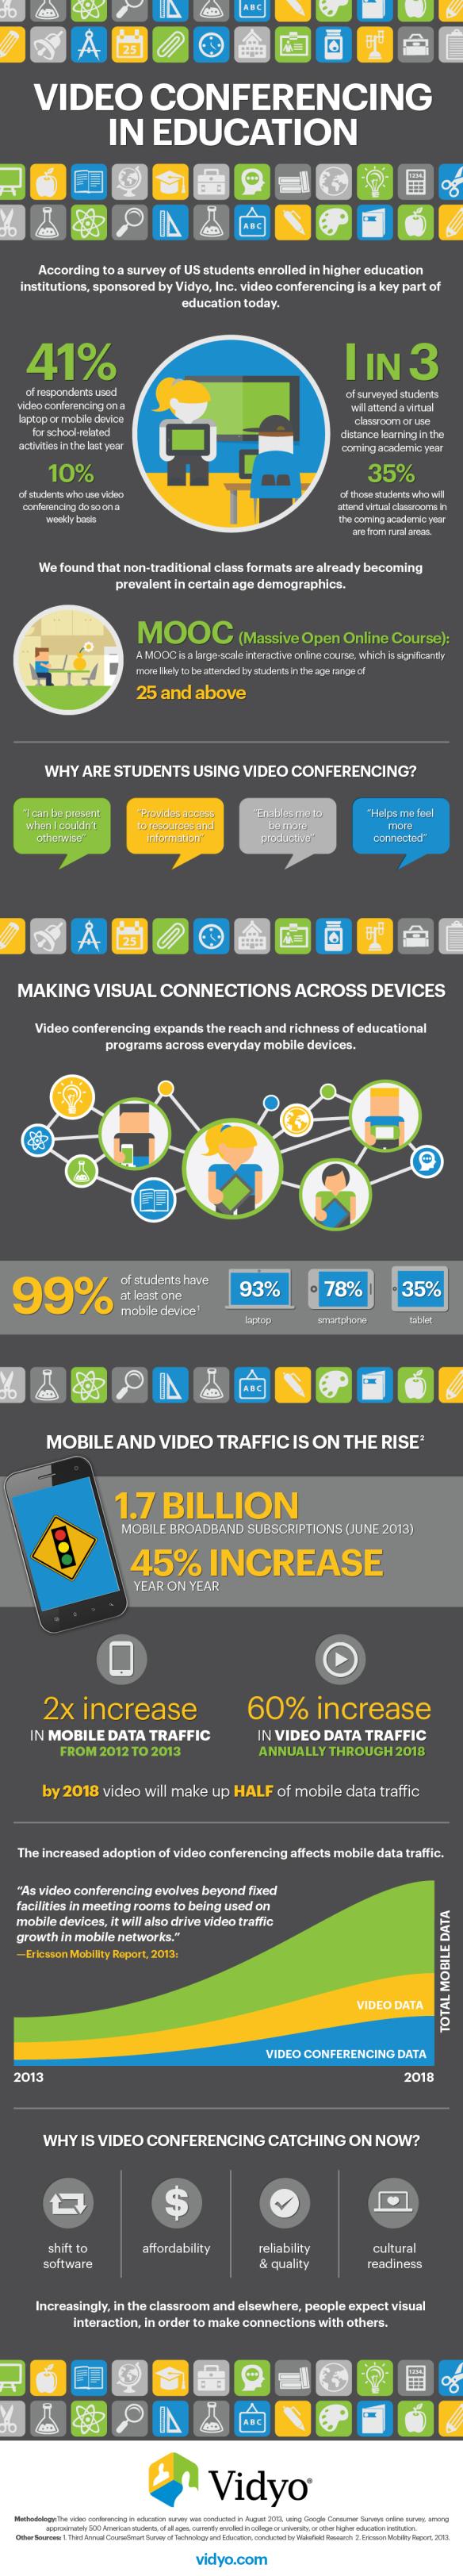 infographic_vidyo_videoconferencingineducation